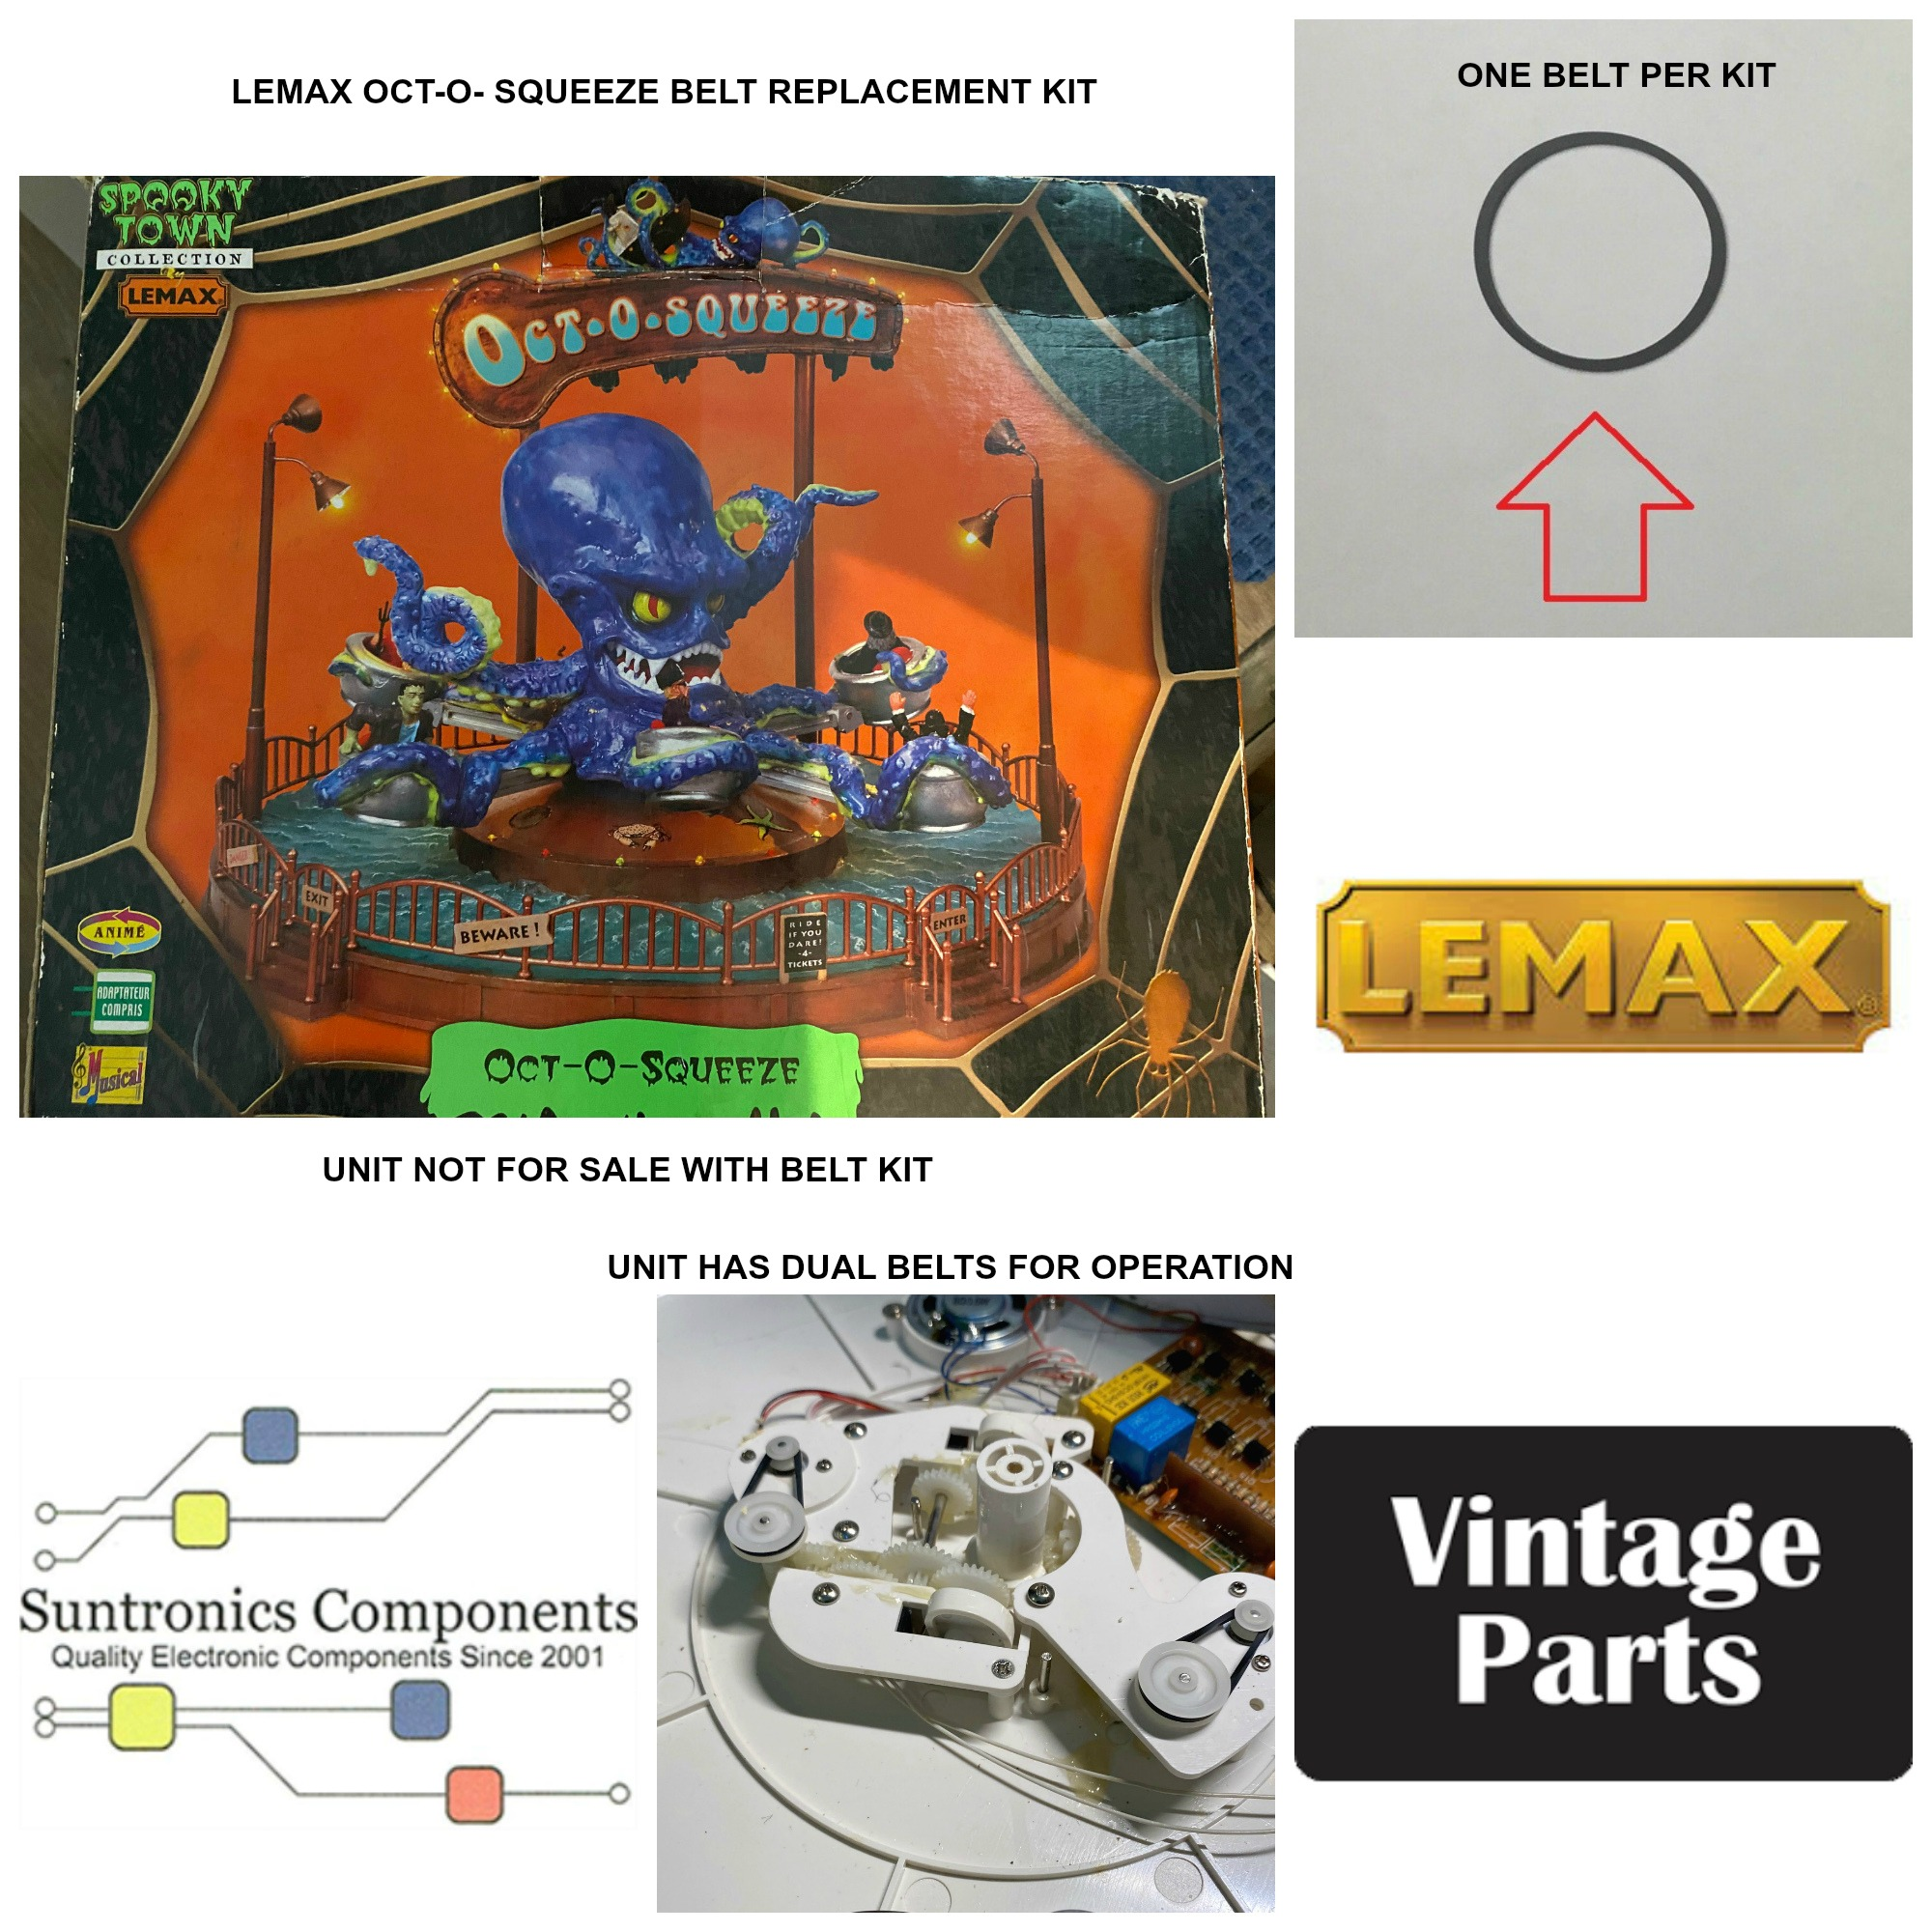 PicMonkey Image LEMAX OCT O SQUEEZE BELT